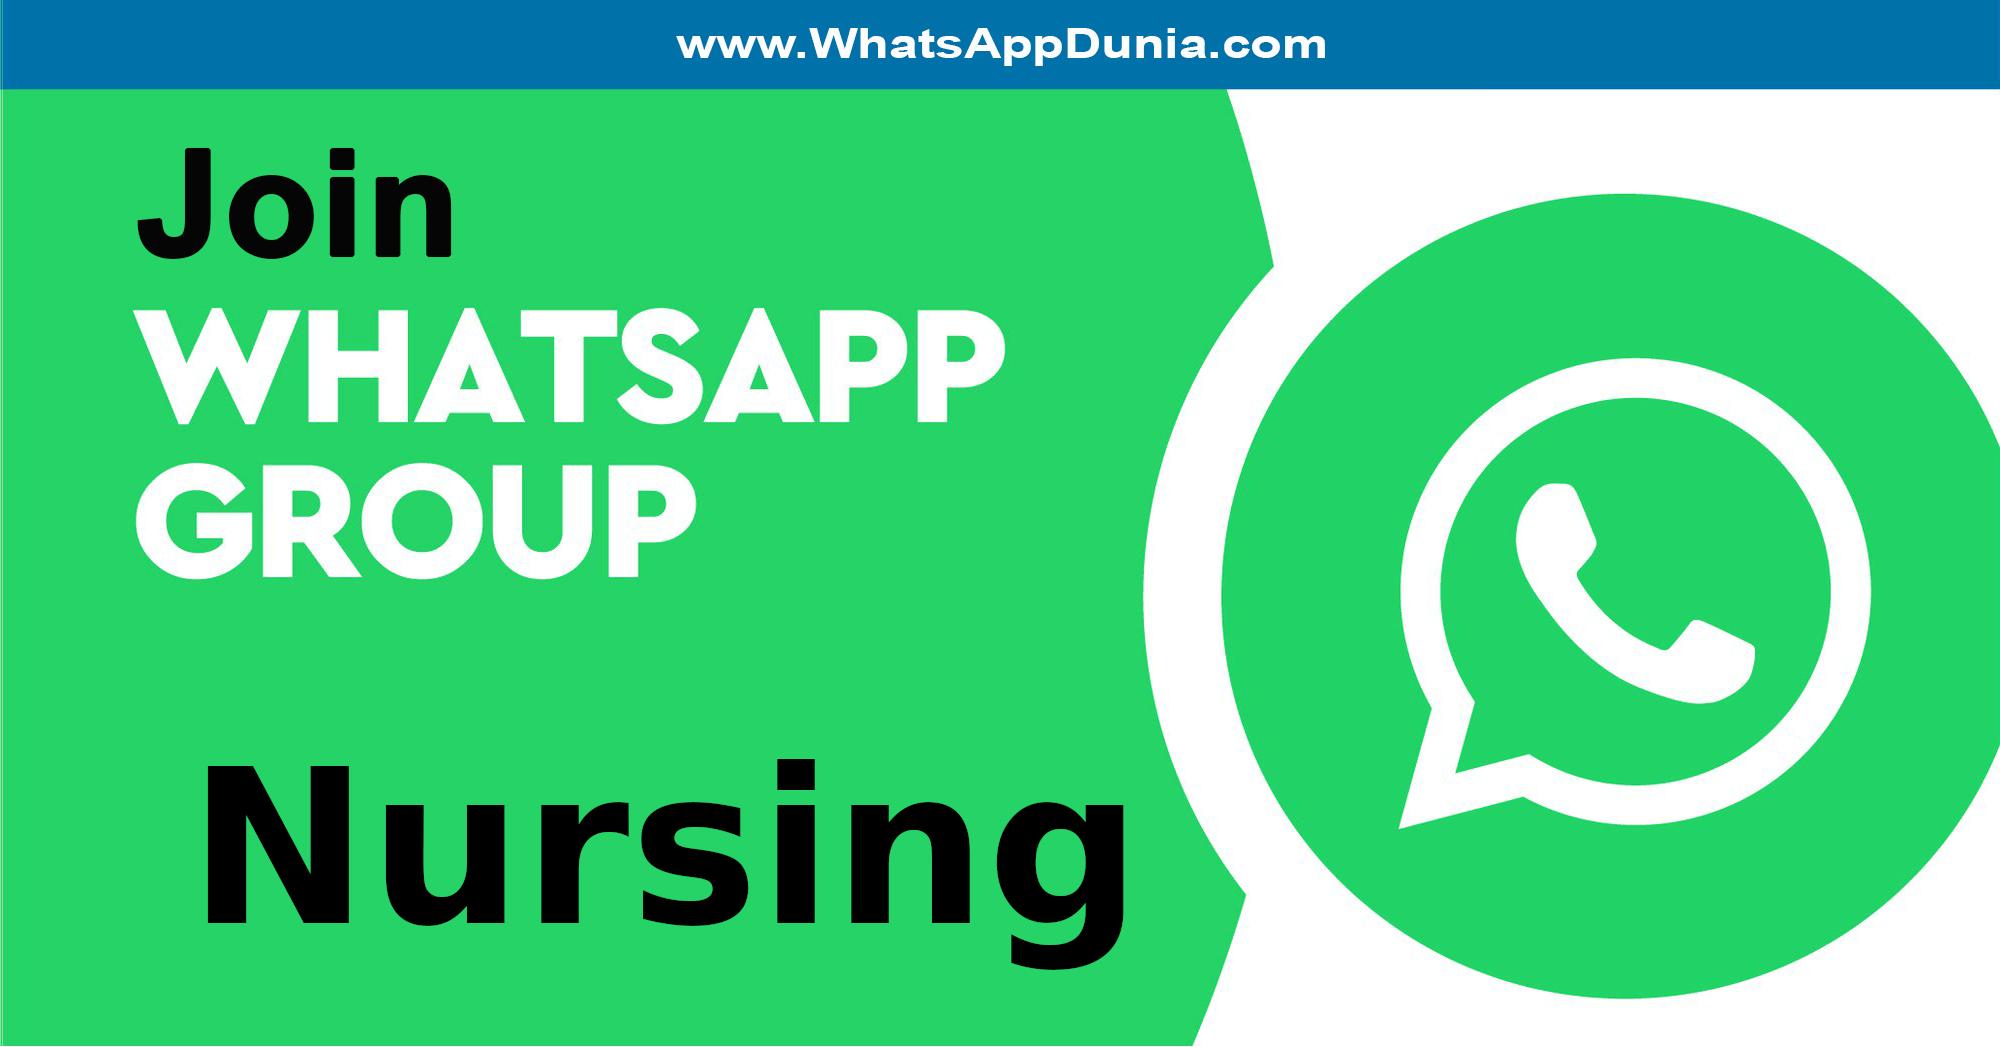 Nursing WhatsApp Group Links